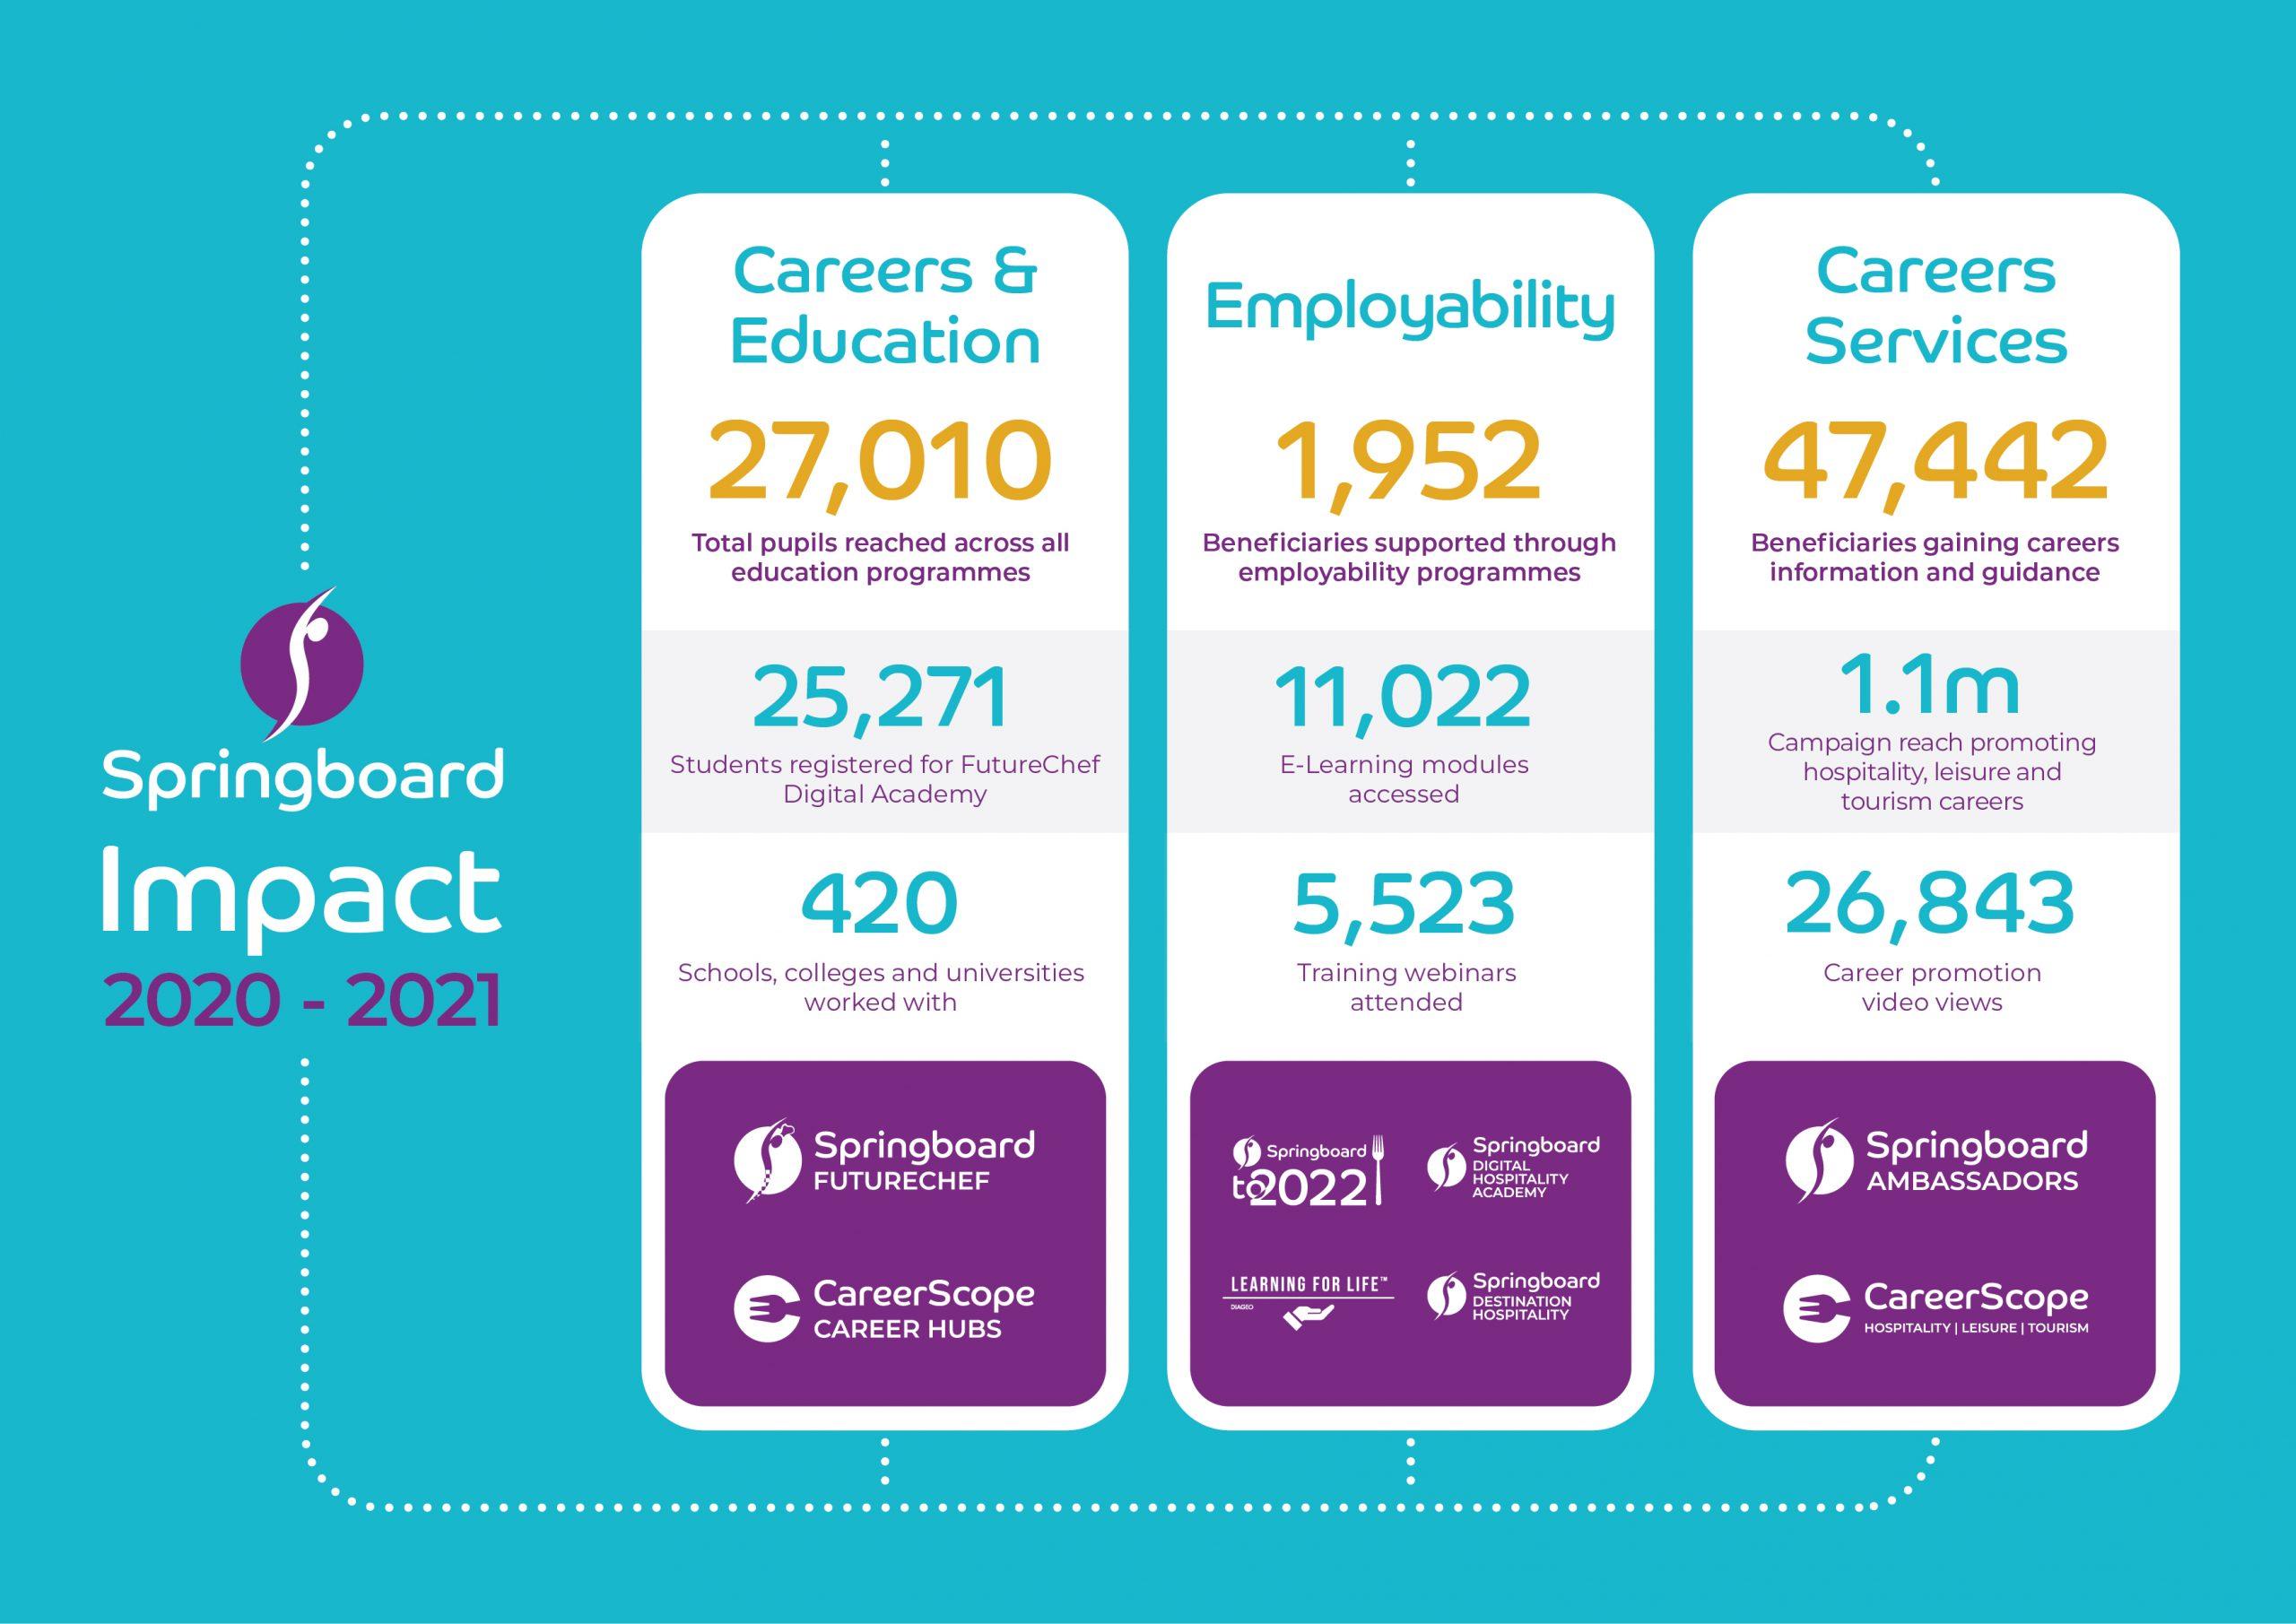 Springboard's Impact 2020-2021